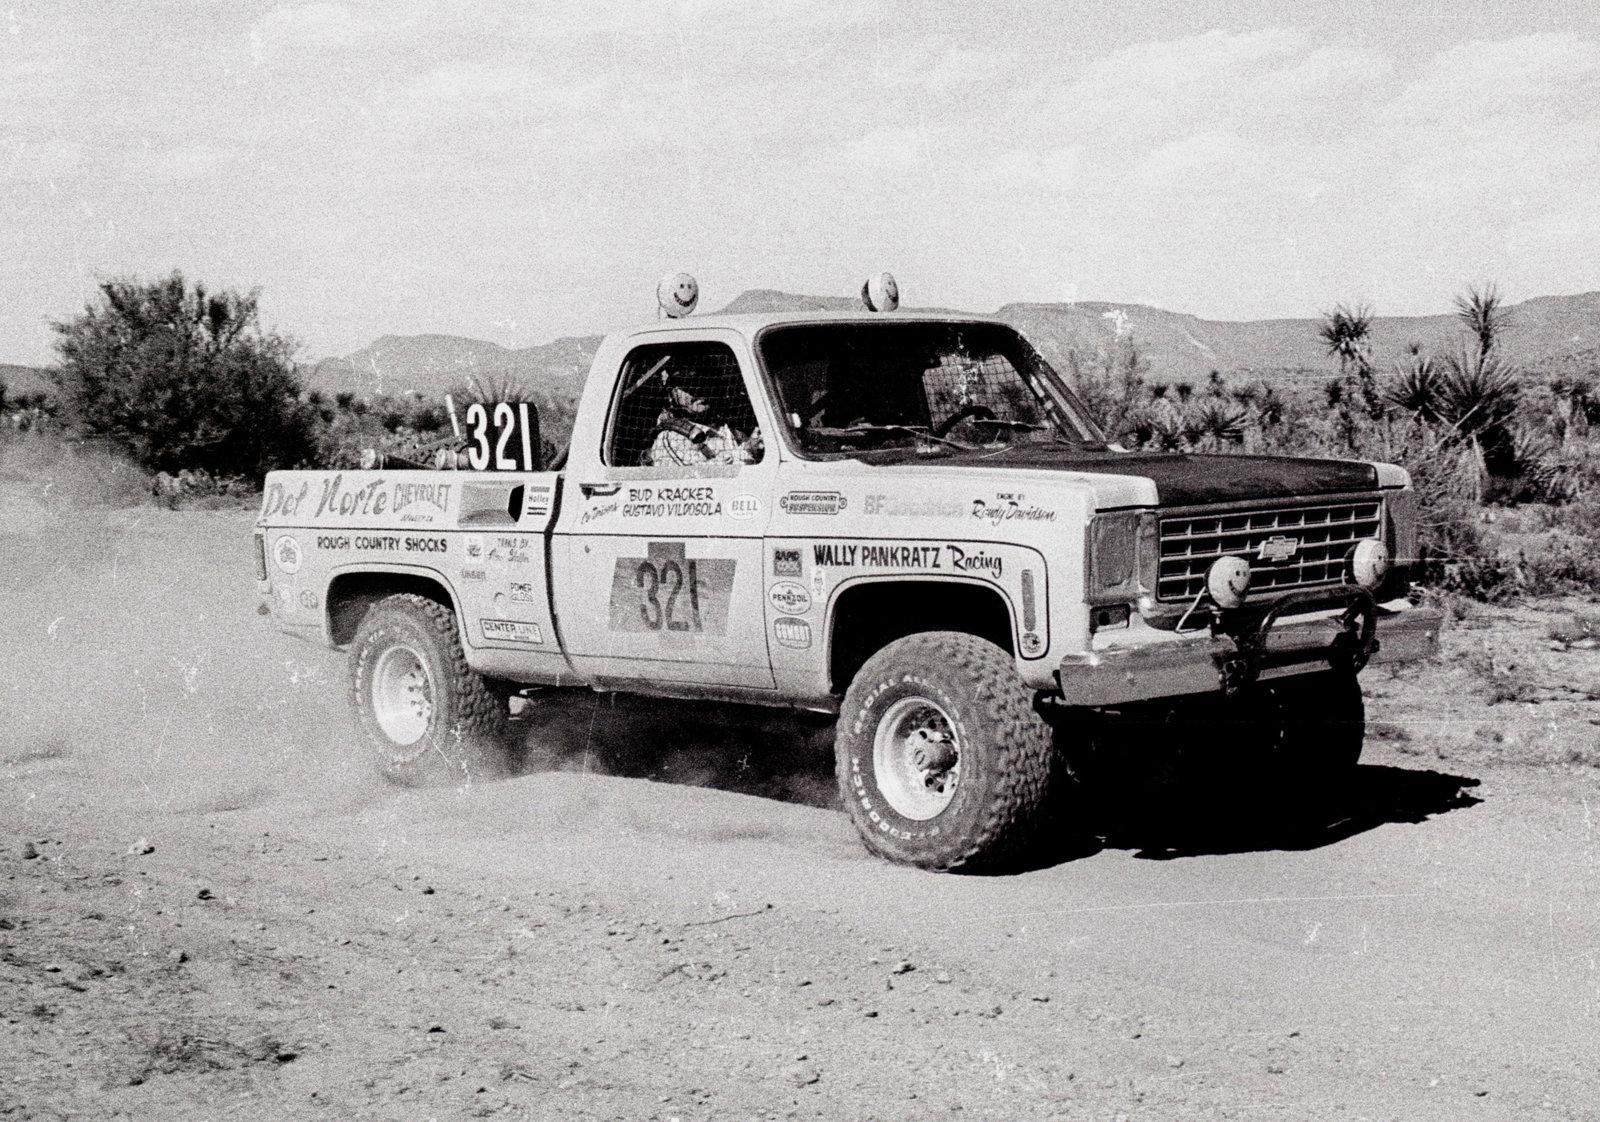 CenterlineImages.1977. Baja 1000. 321. Pankratz. Vildosola.21x.jpg